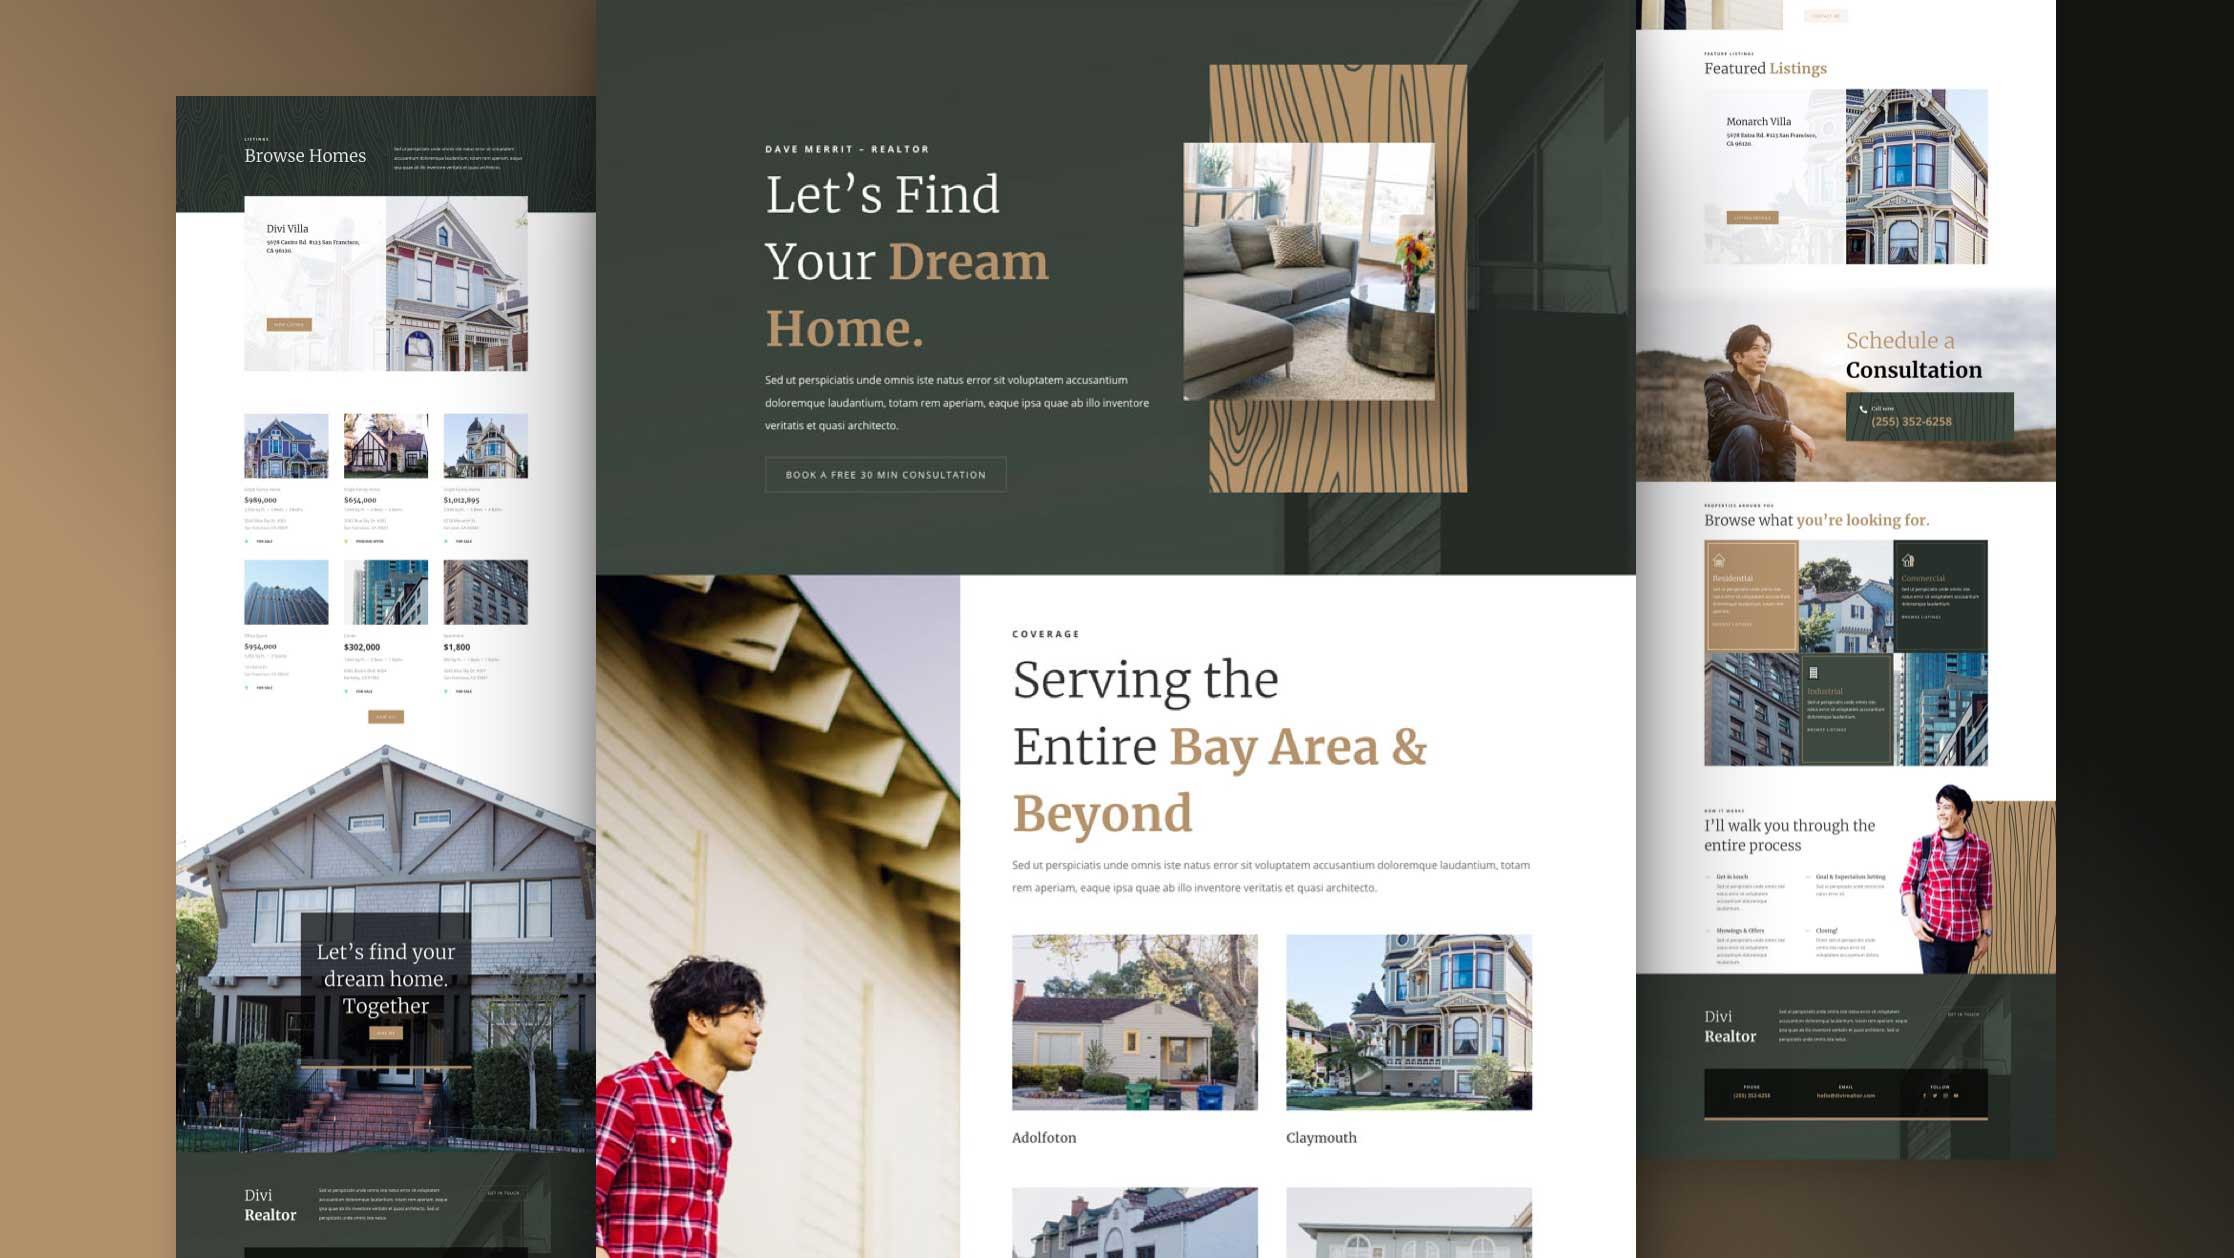 immobilienmakler-divi-kostenloses-layout-pack